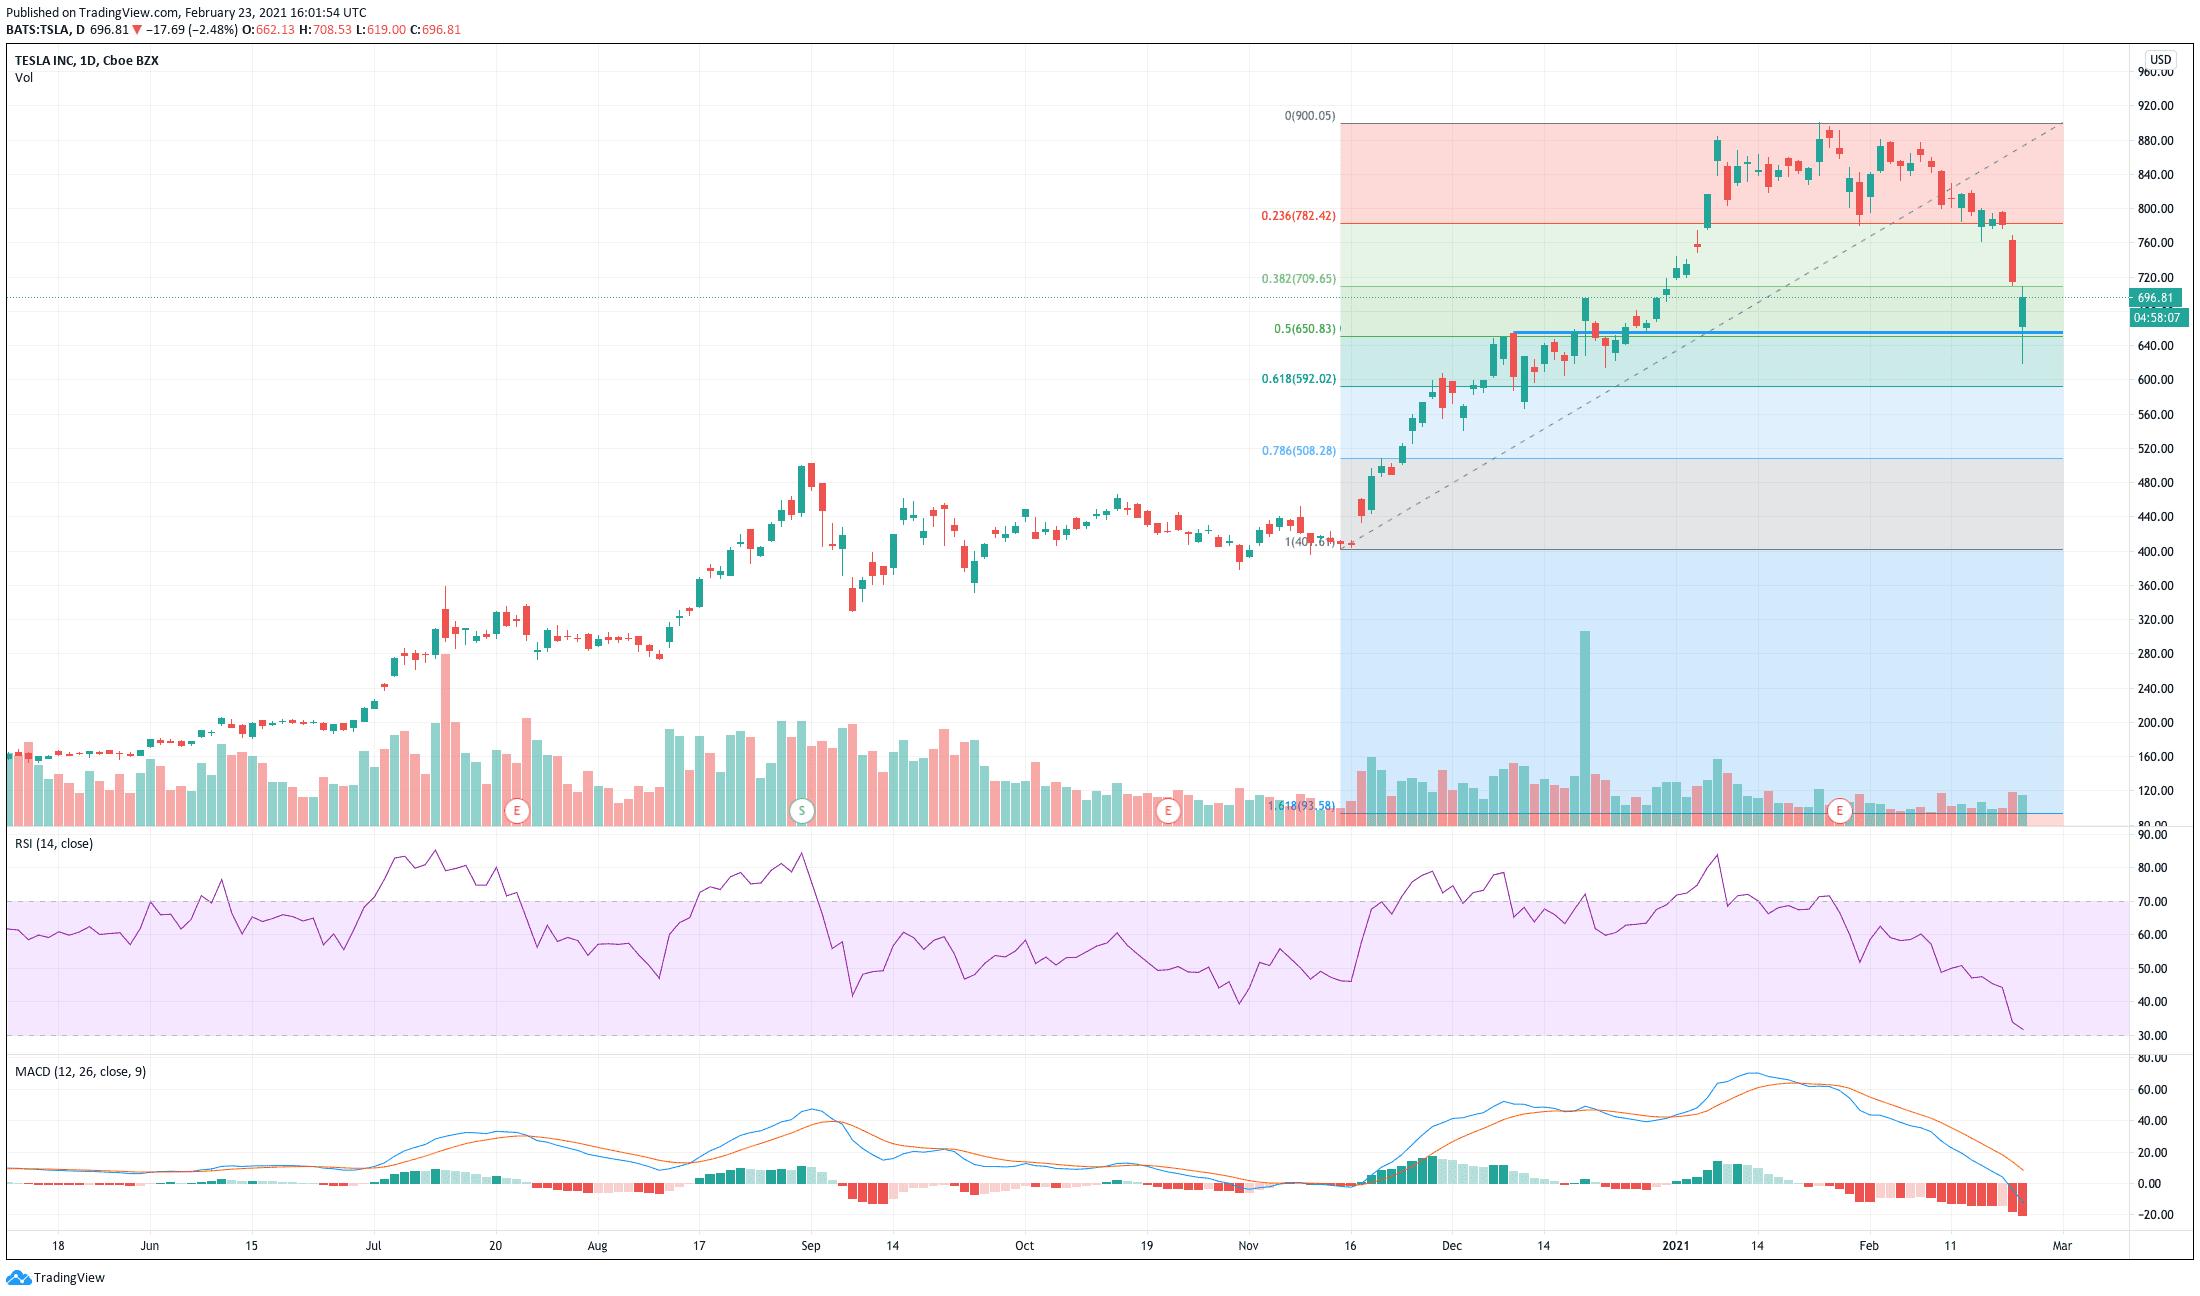 Chart showing the share price performance of Tesla, Inc. (TSLA)